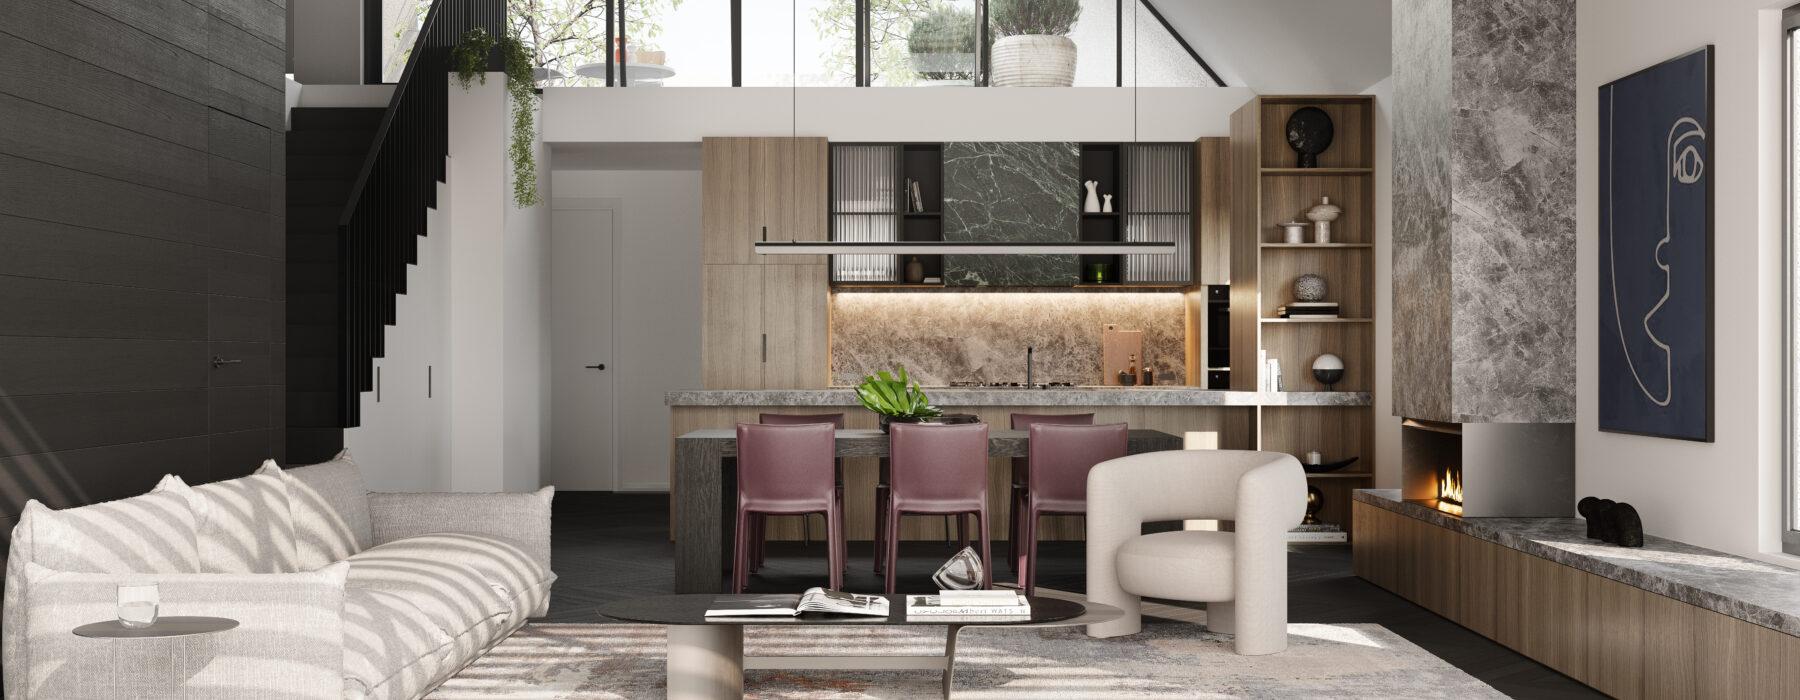 Brougham Kitchen Living Unit 3 Final www nordstudio com au JPG